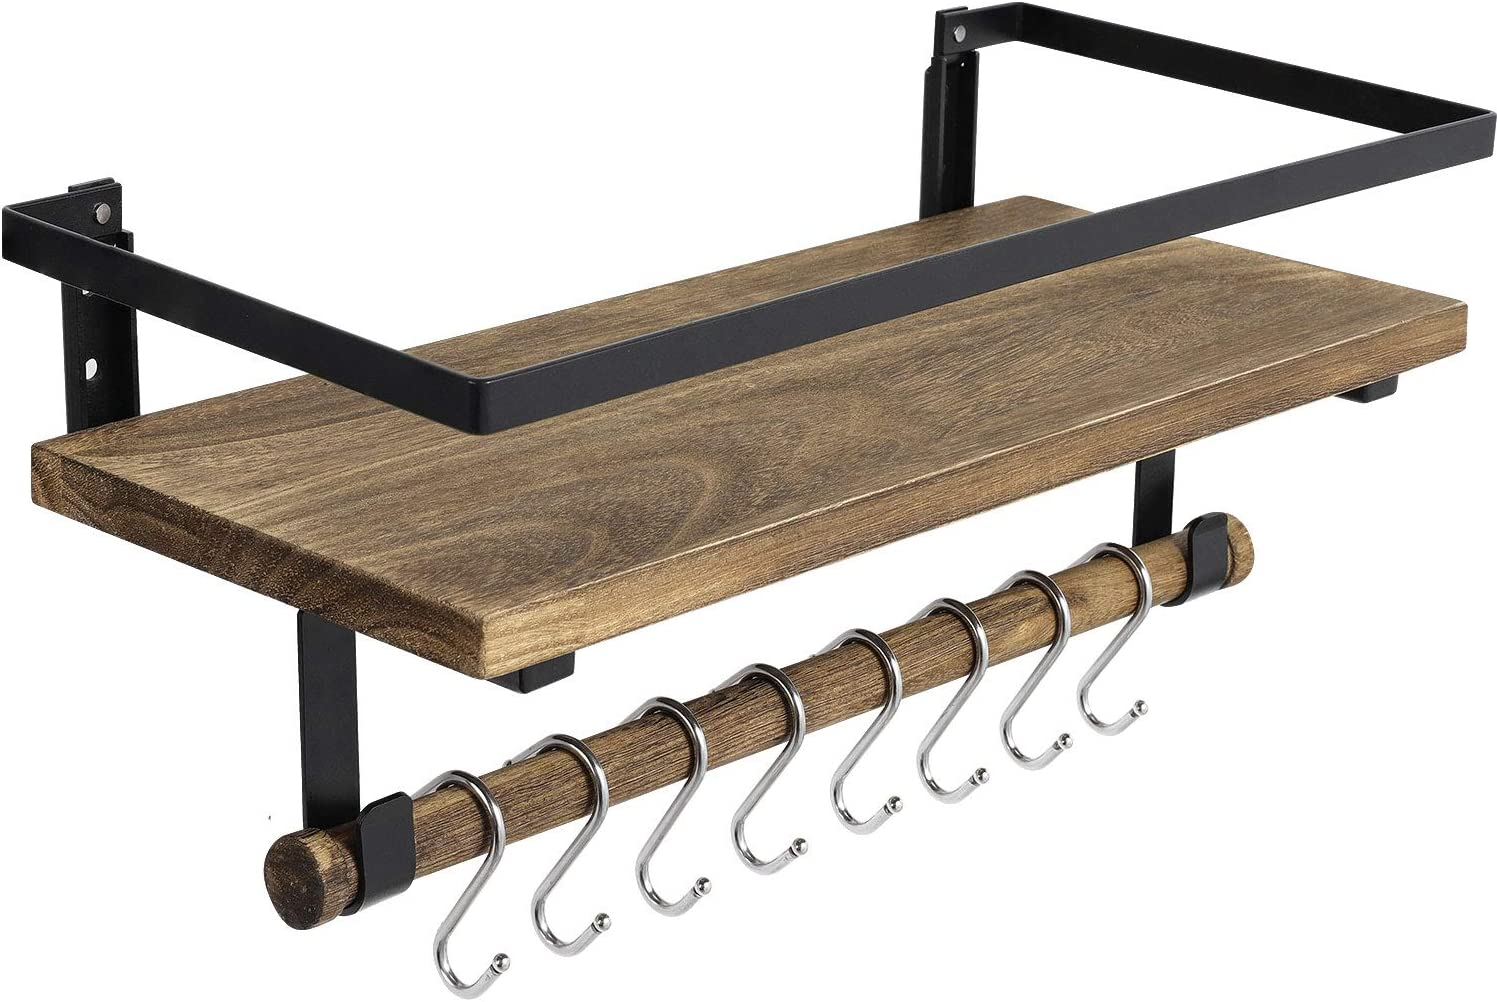 BAYKA Floating Shelf Wall Mounted, Rustic Wood Shelf for Bathroom Kitchen, Decor Storage Shelf with 8 Removable Hooks and Towel Bar